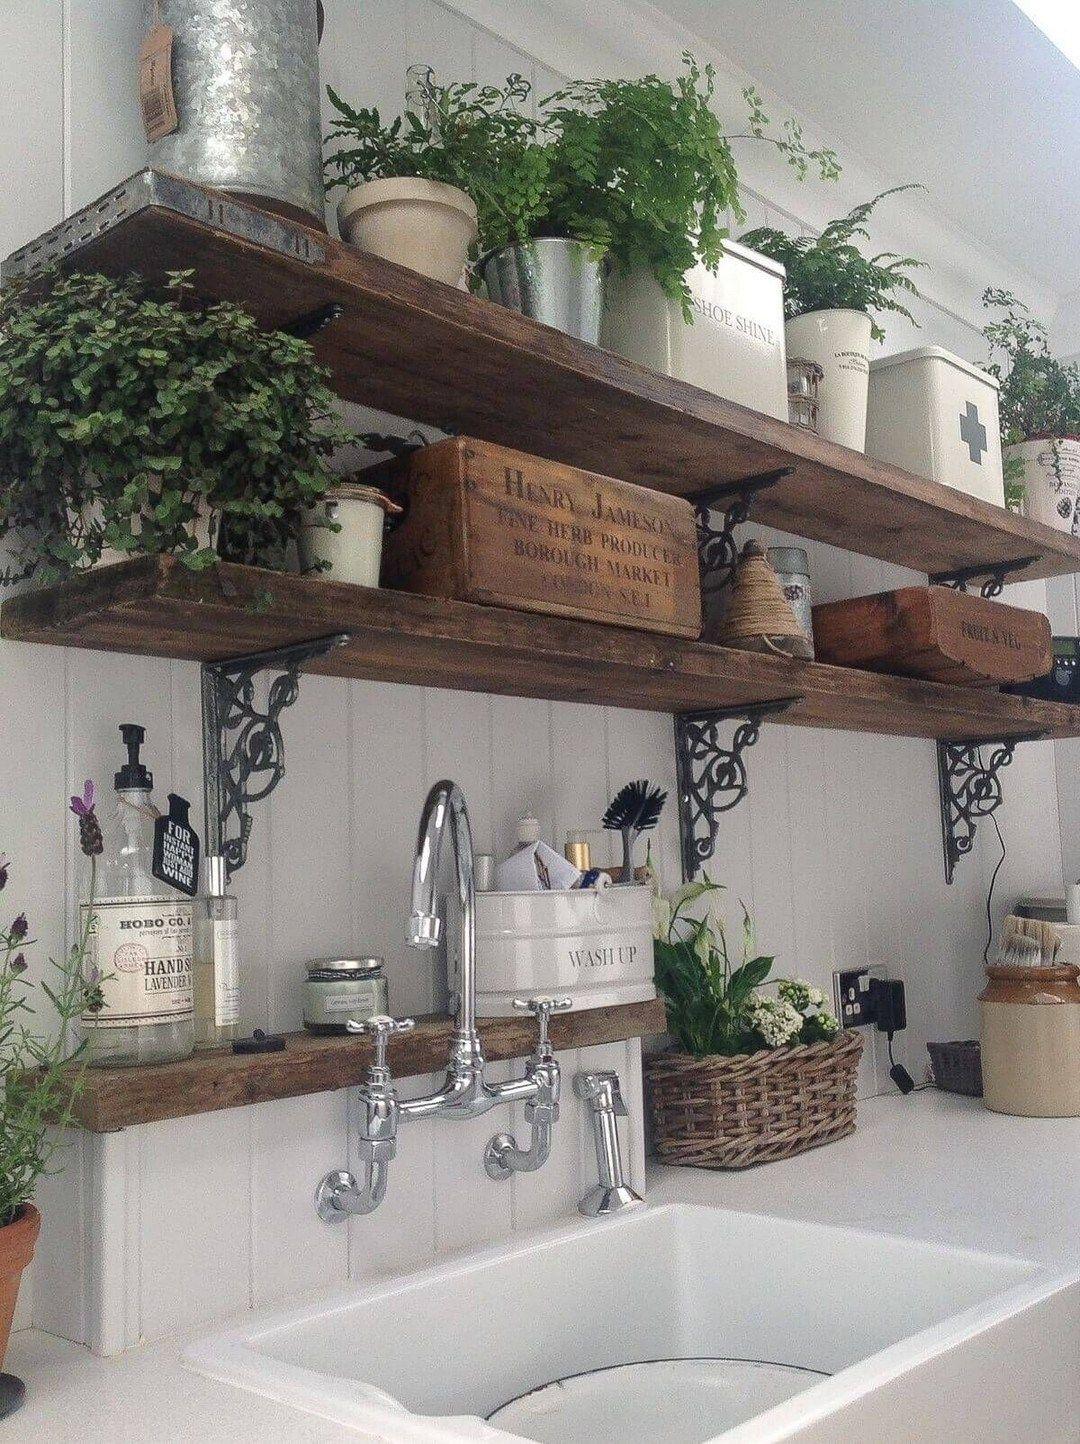 33 Charming French Kitchen Decor Inspirational Ideas 3 Kitchendecorpad Rustic Kitchen Country Kitchen Wooden Shelves Kitchen